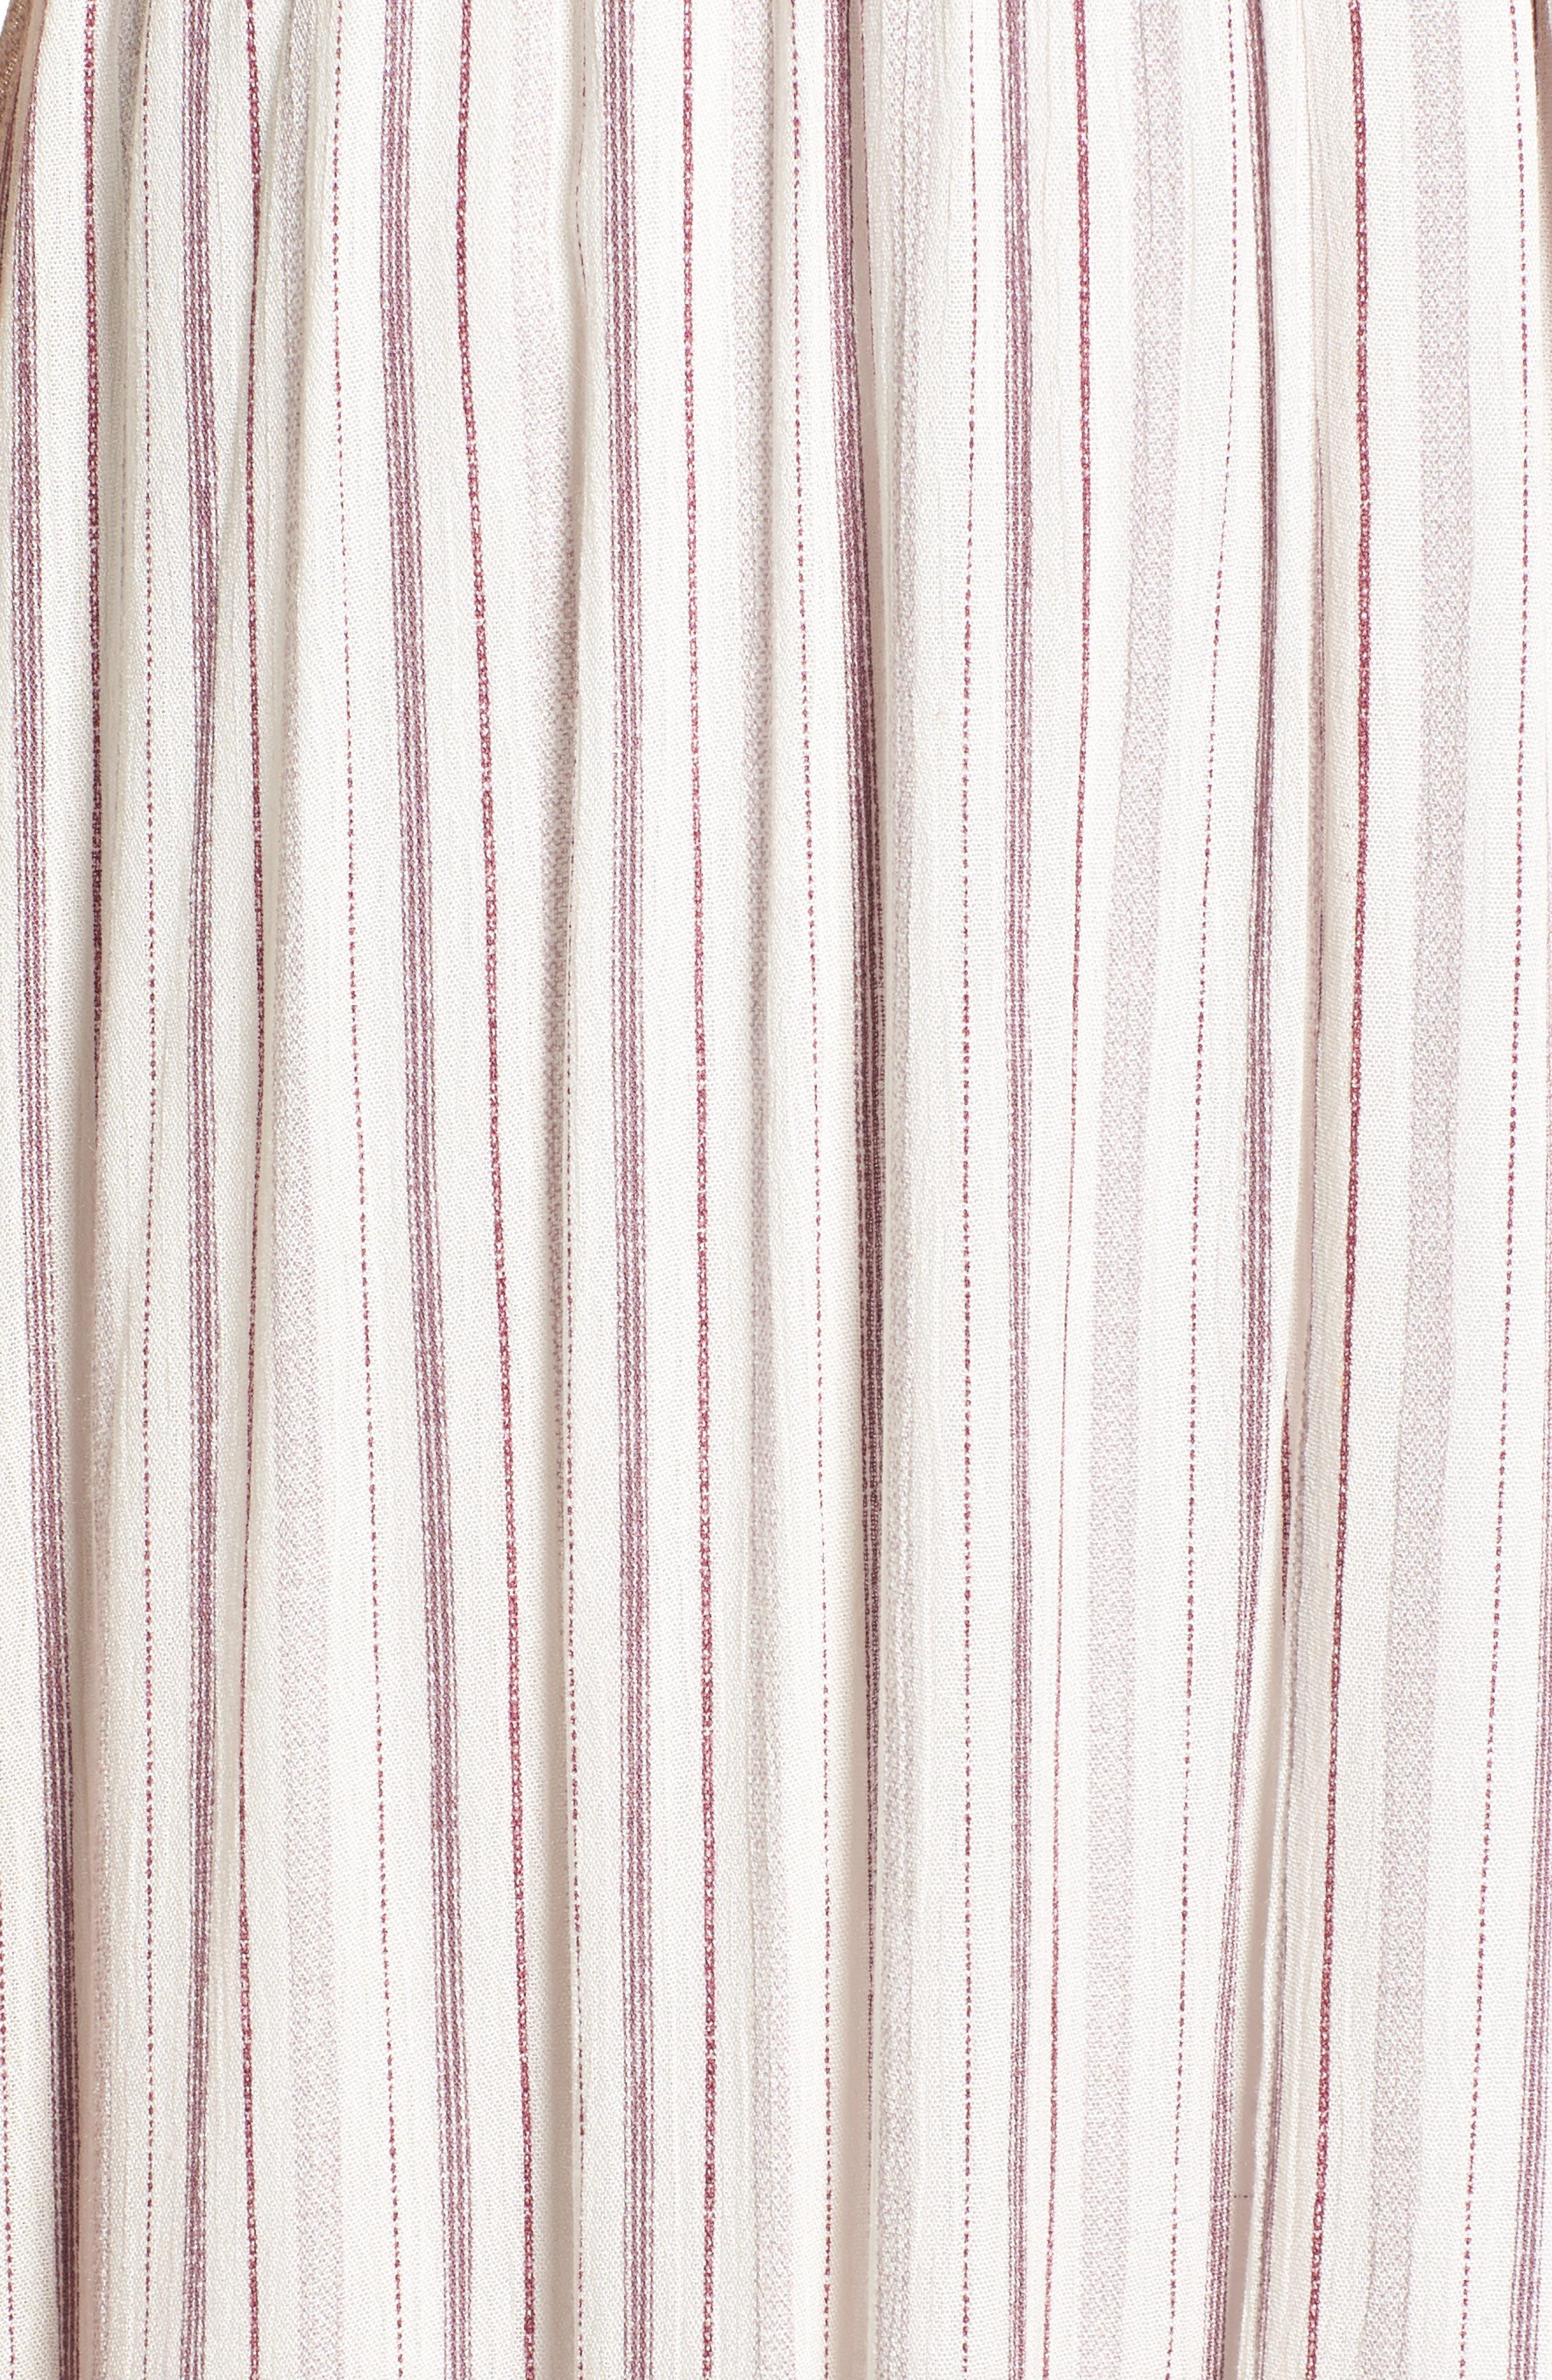 Daydreamer Stripe Maxi Dress,                             Alternate thumbnail 5, color,                             Ivory/ Mauve